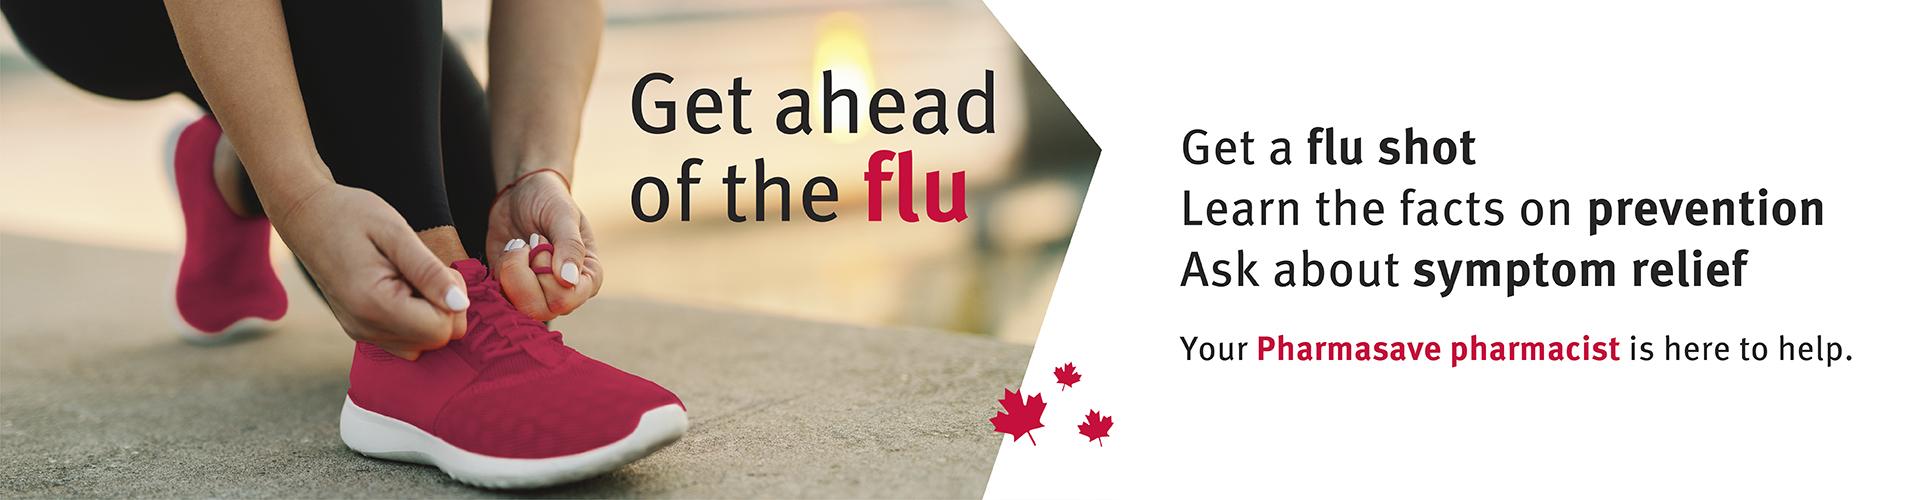 Get ahead of the flu.